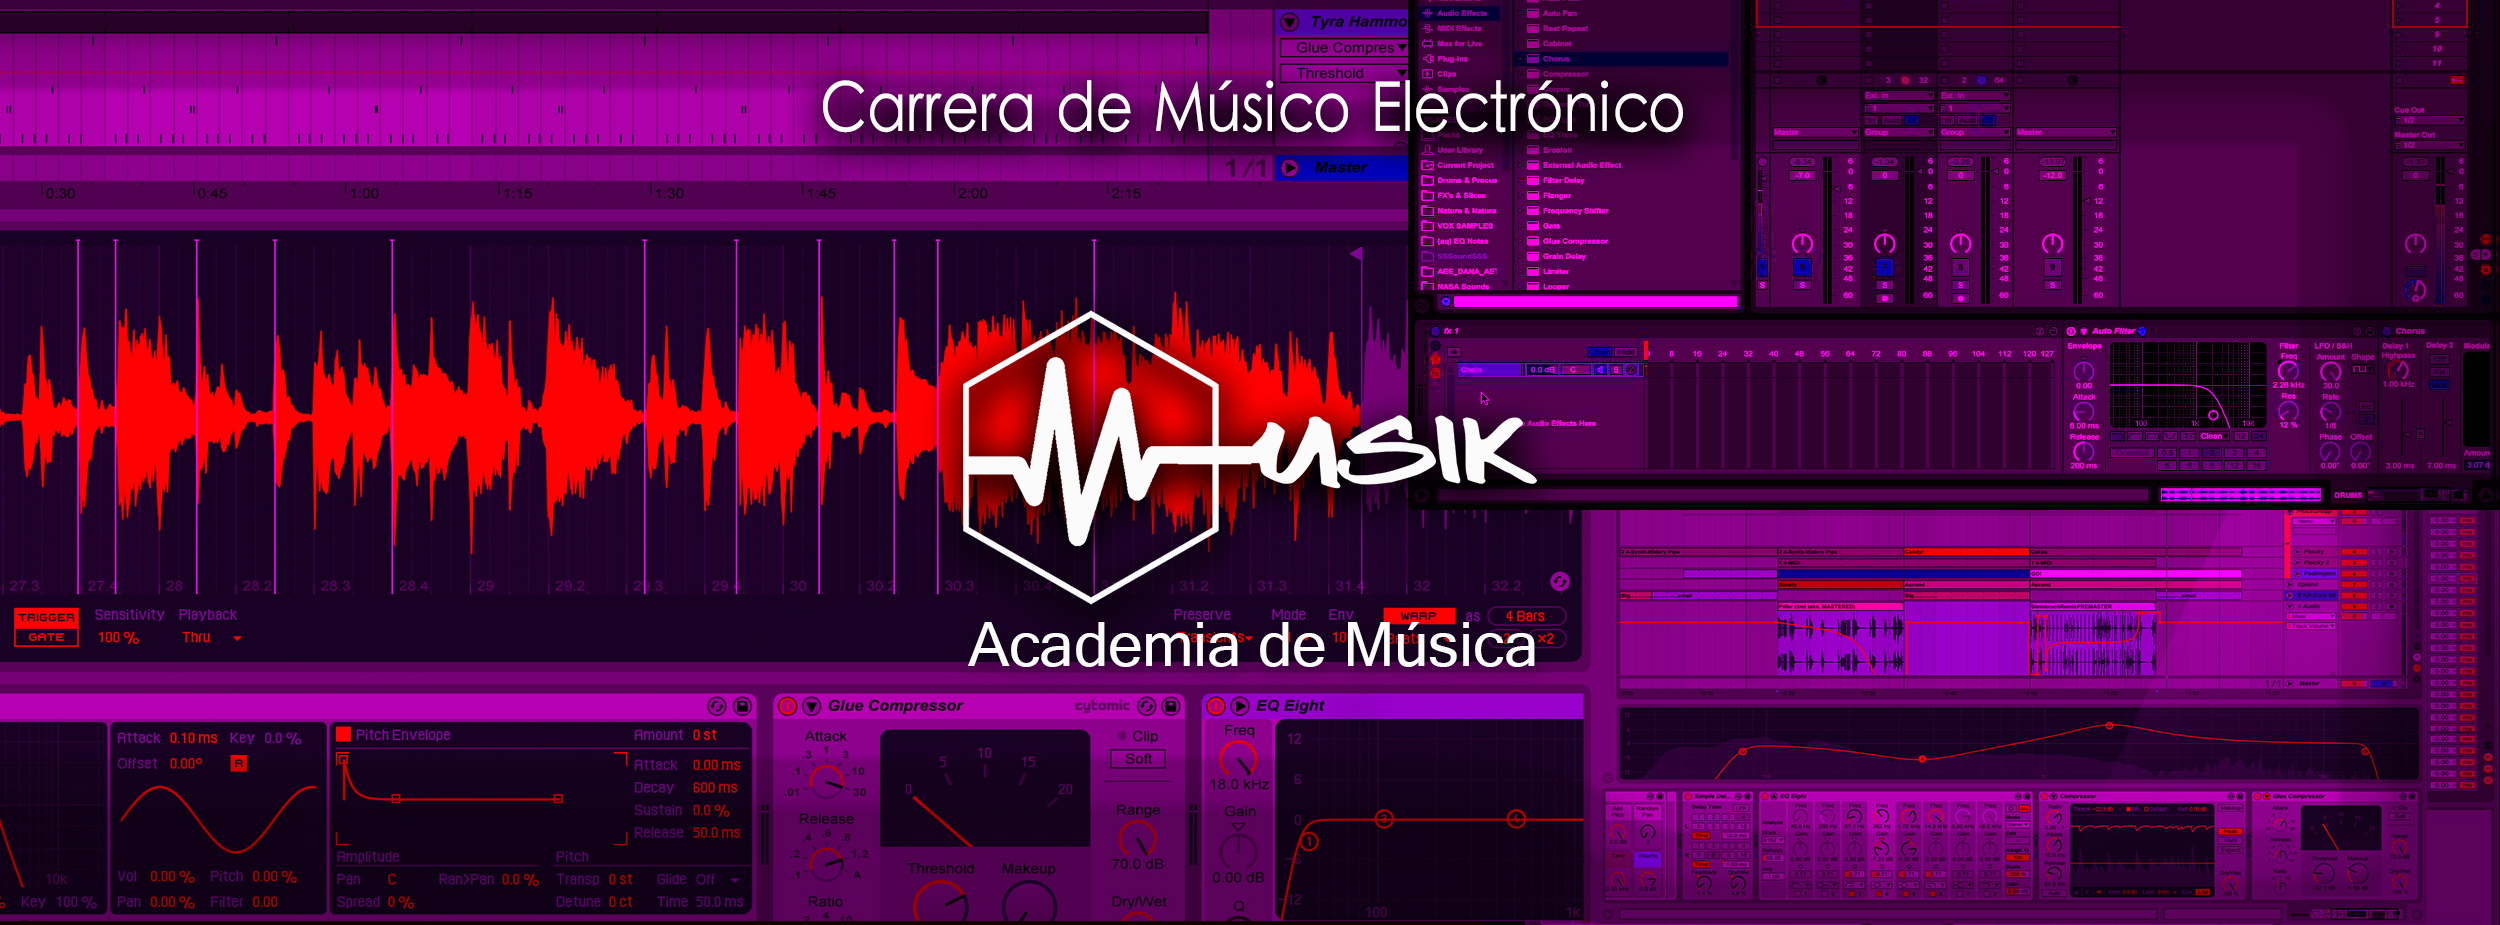 Musik 024 - Carrera Musico Elecxtronico